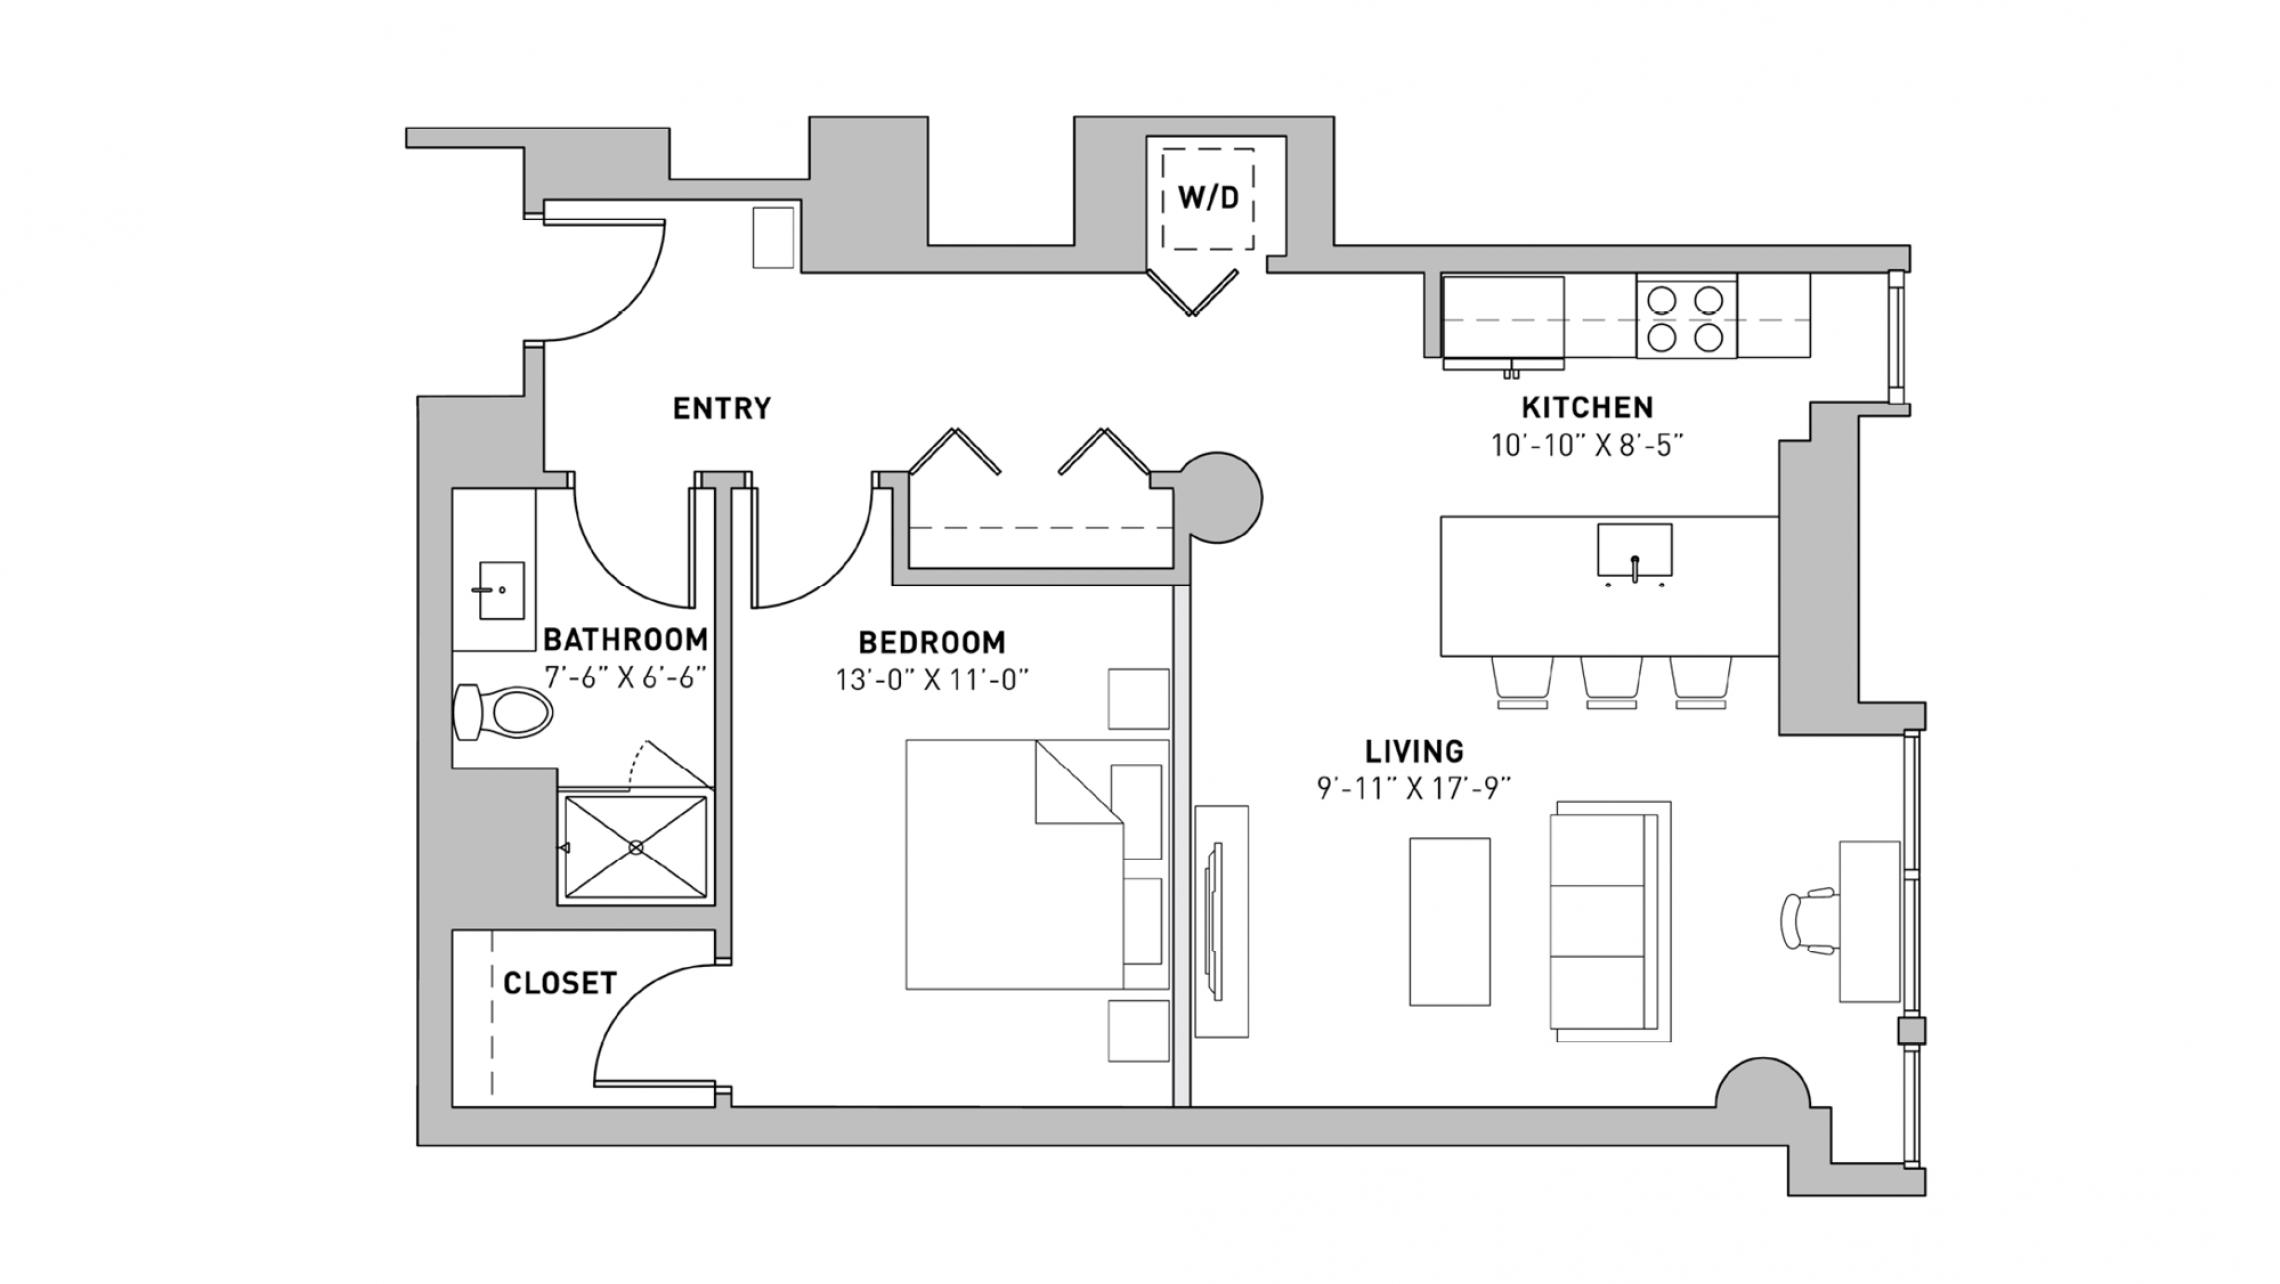 ULI The Pressman 213 - One Bedroom, One Bathroom